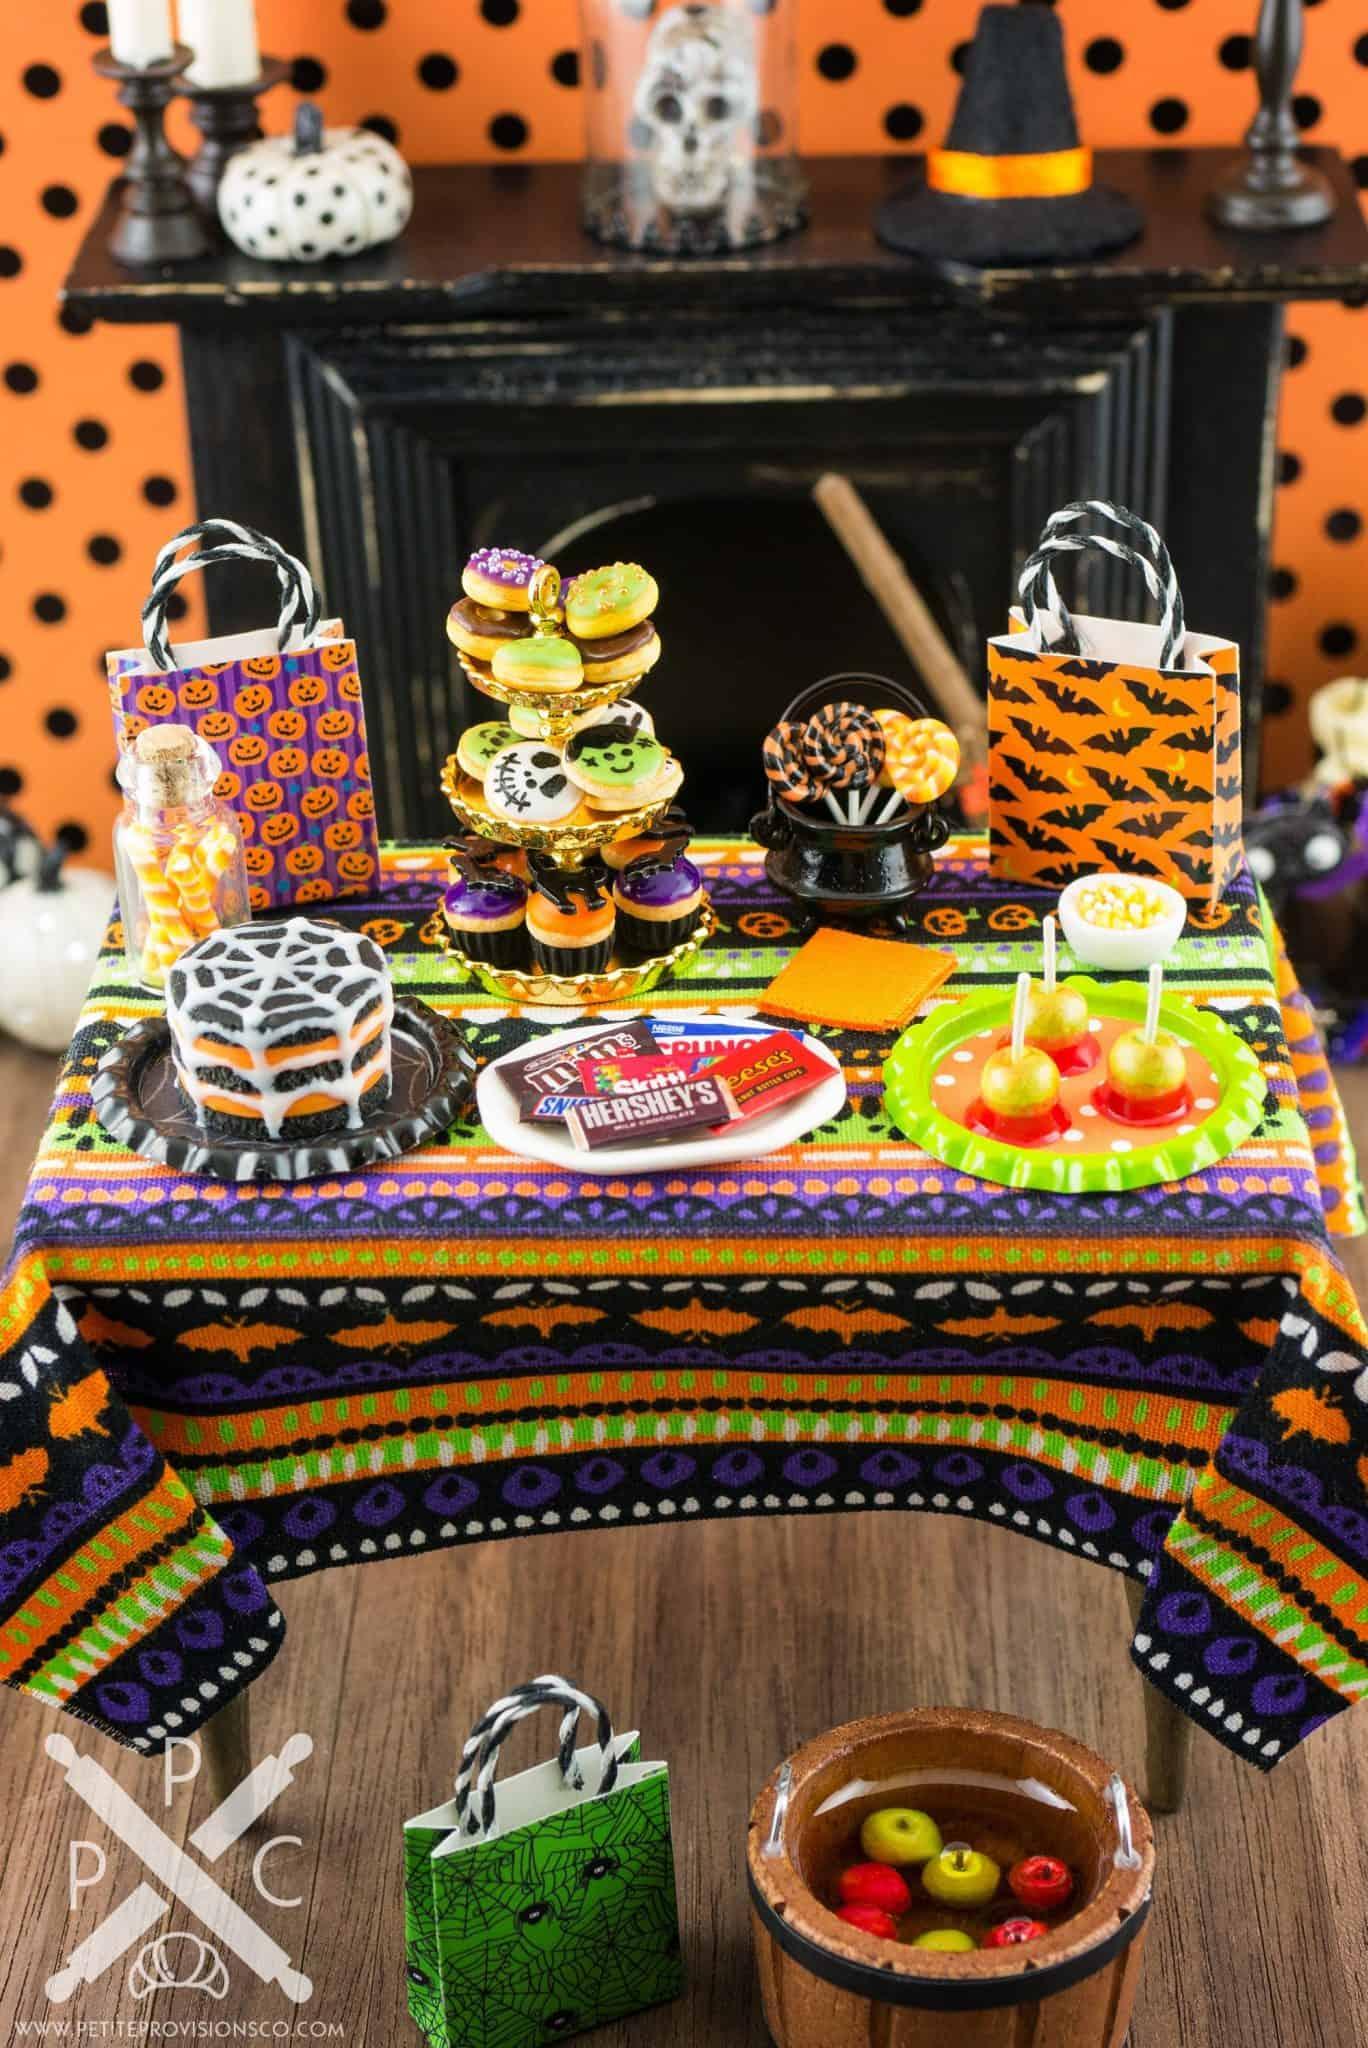 miniature halloween trick or treat table 1 12 dollhouse miniature the petite provisions co. Black Bedroom Furniture Sets. Home Design Ideas